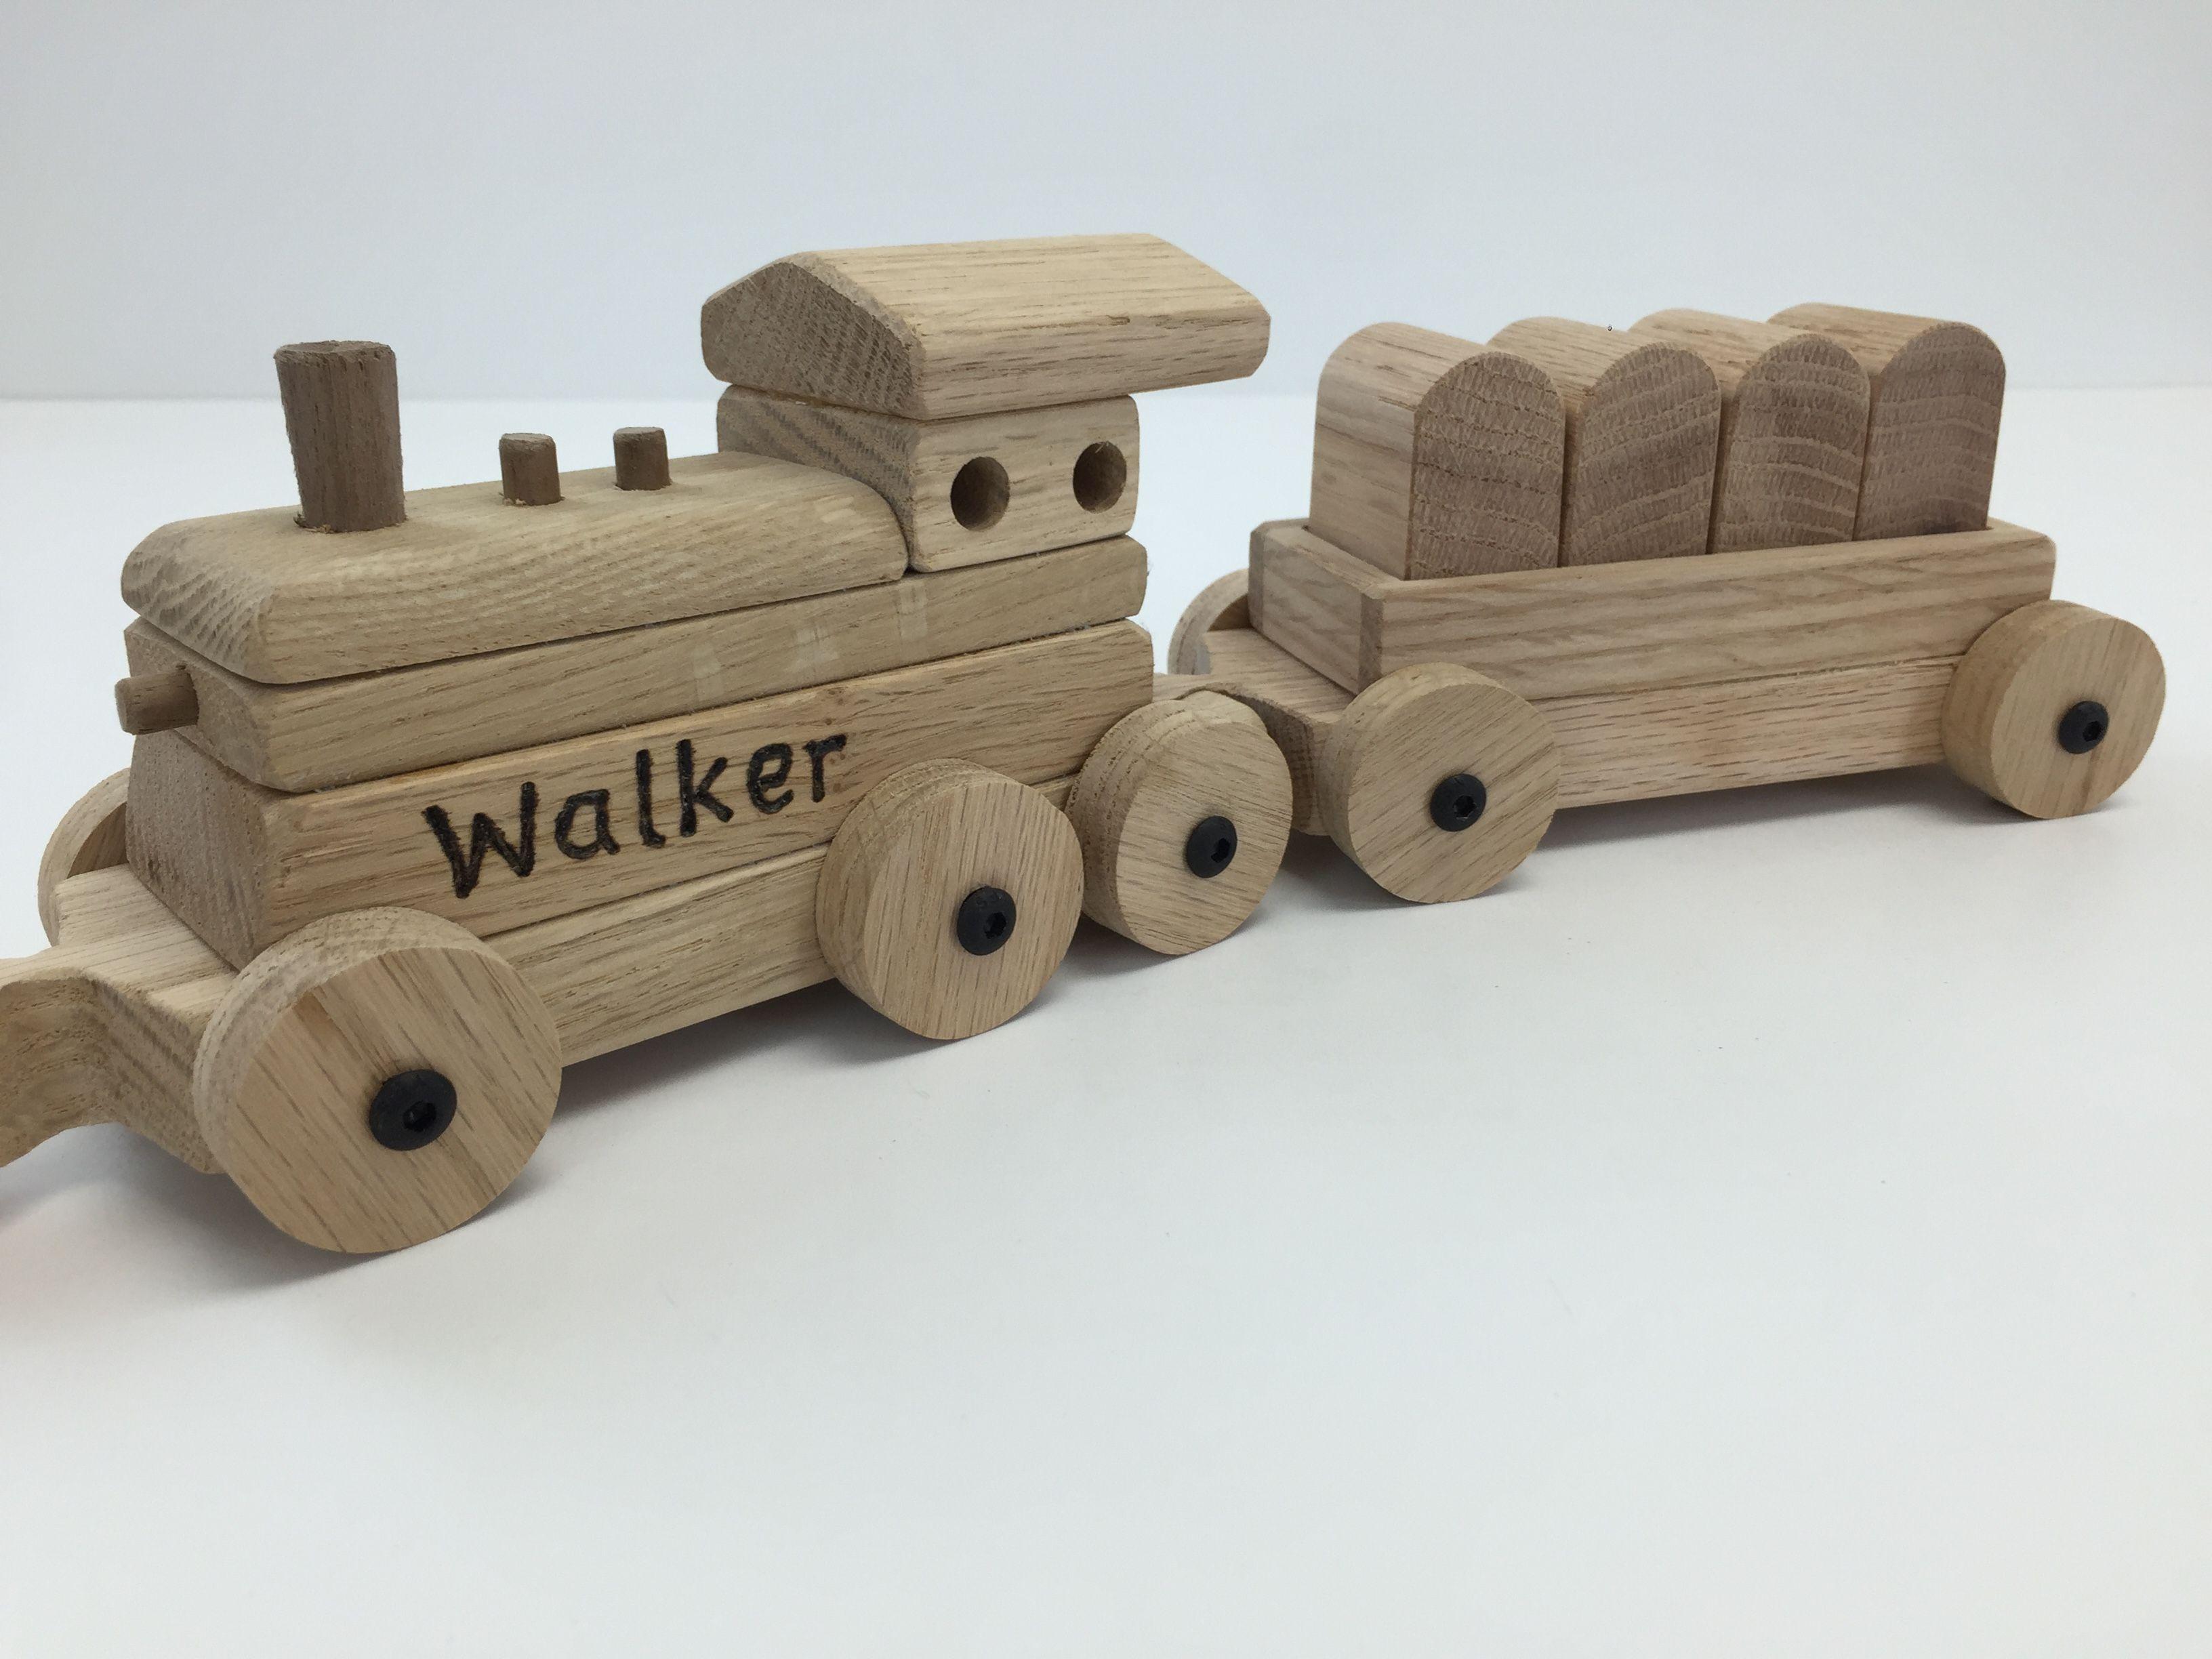 personalized oak cherry and black walnut toy train set with